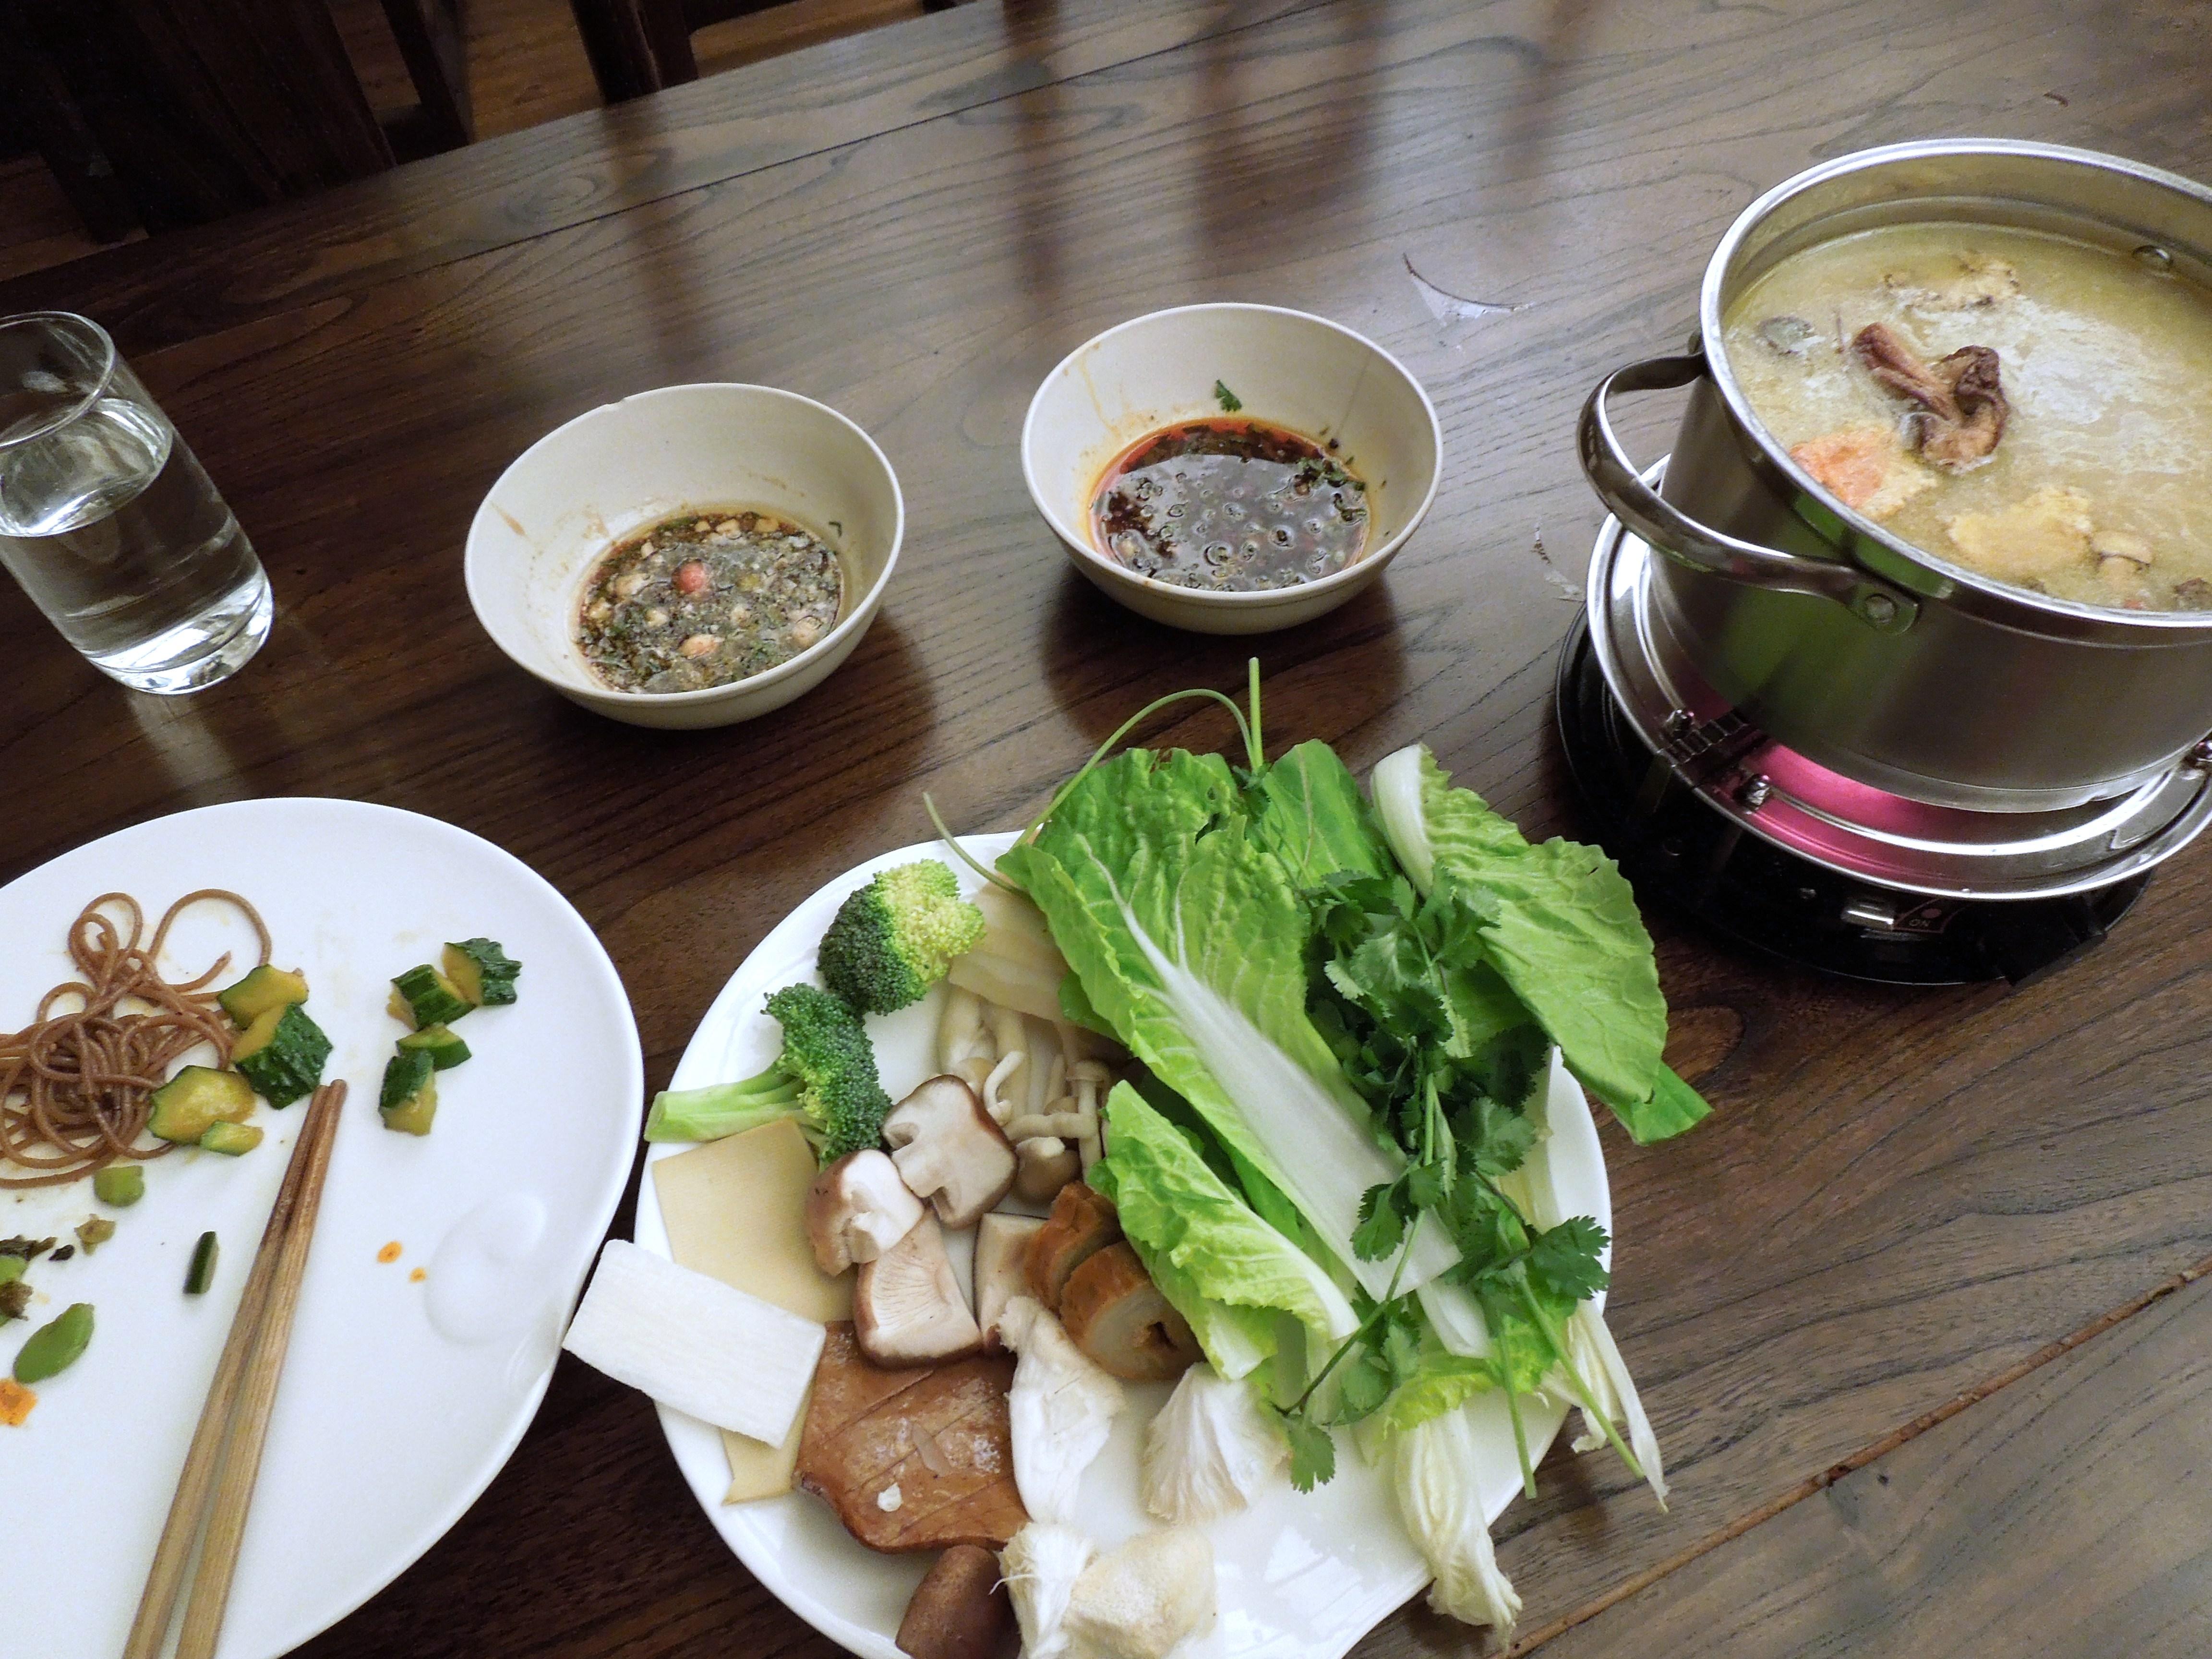 hotpot kiina ruoka